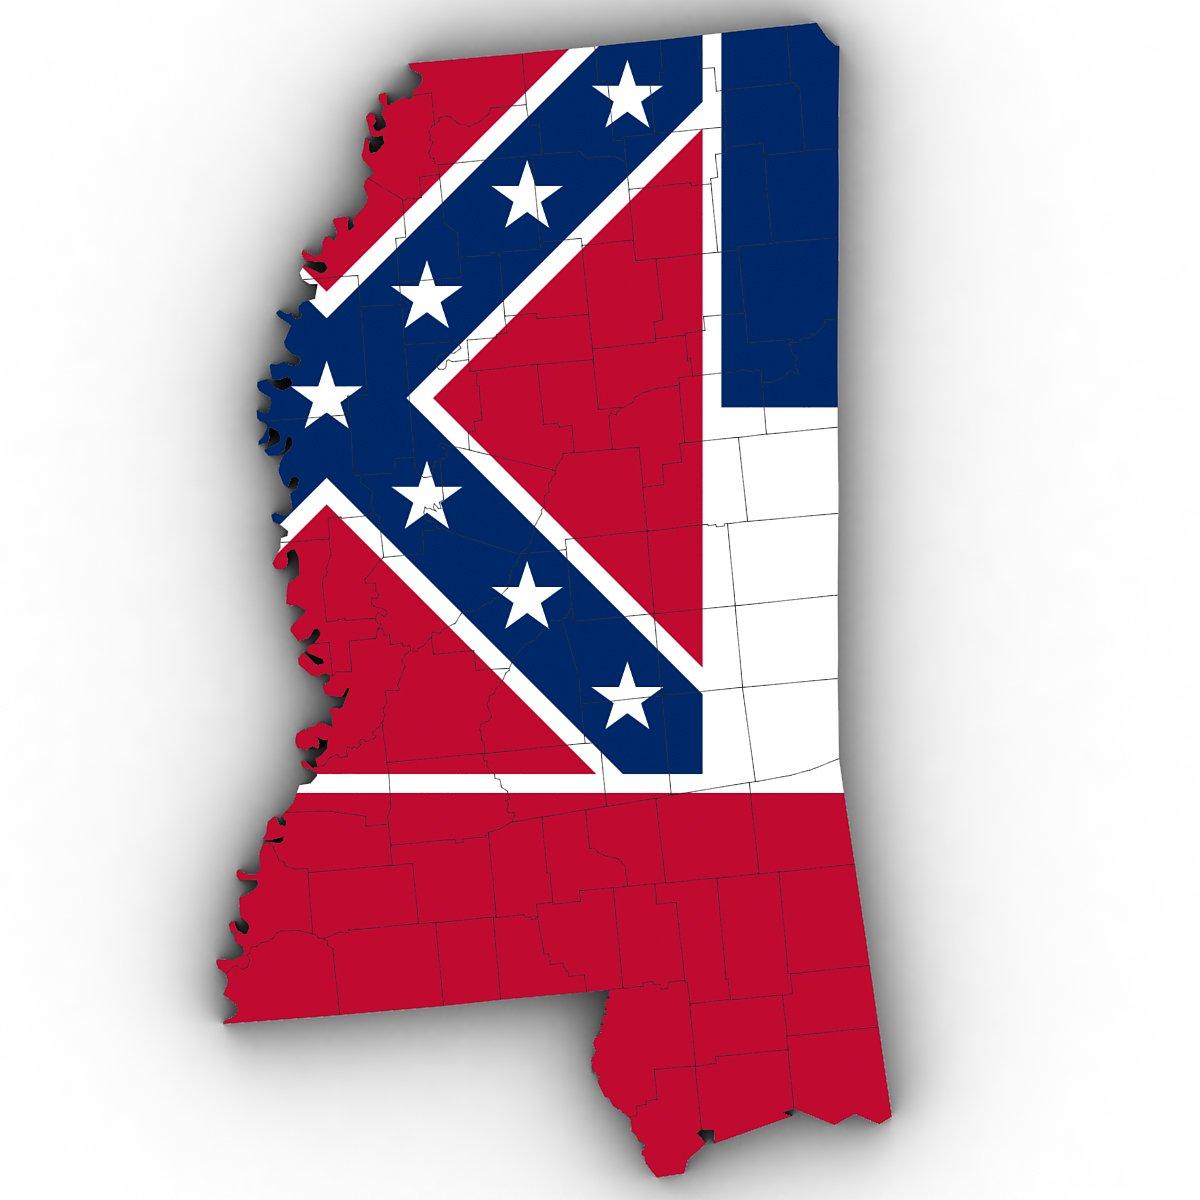 Mississippi Political Map 3d Model In Environment 3dexport